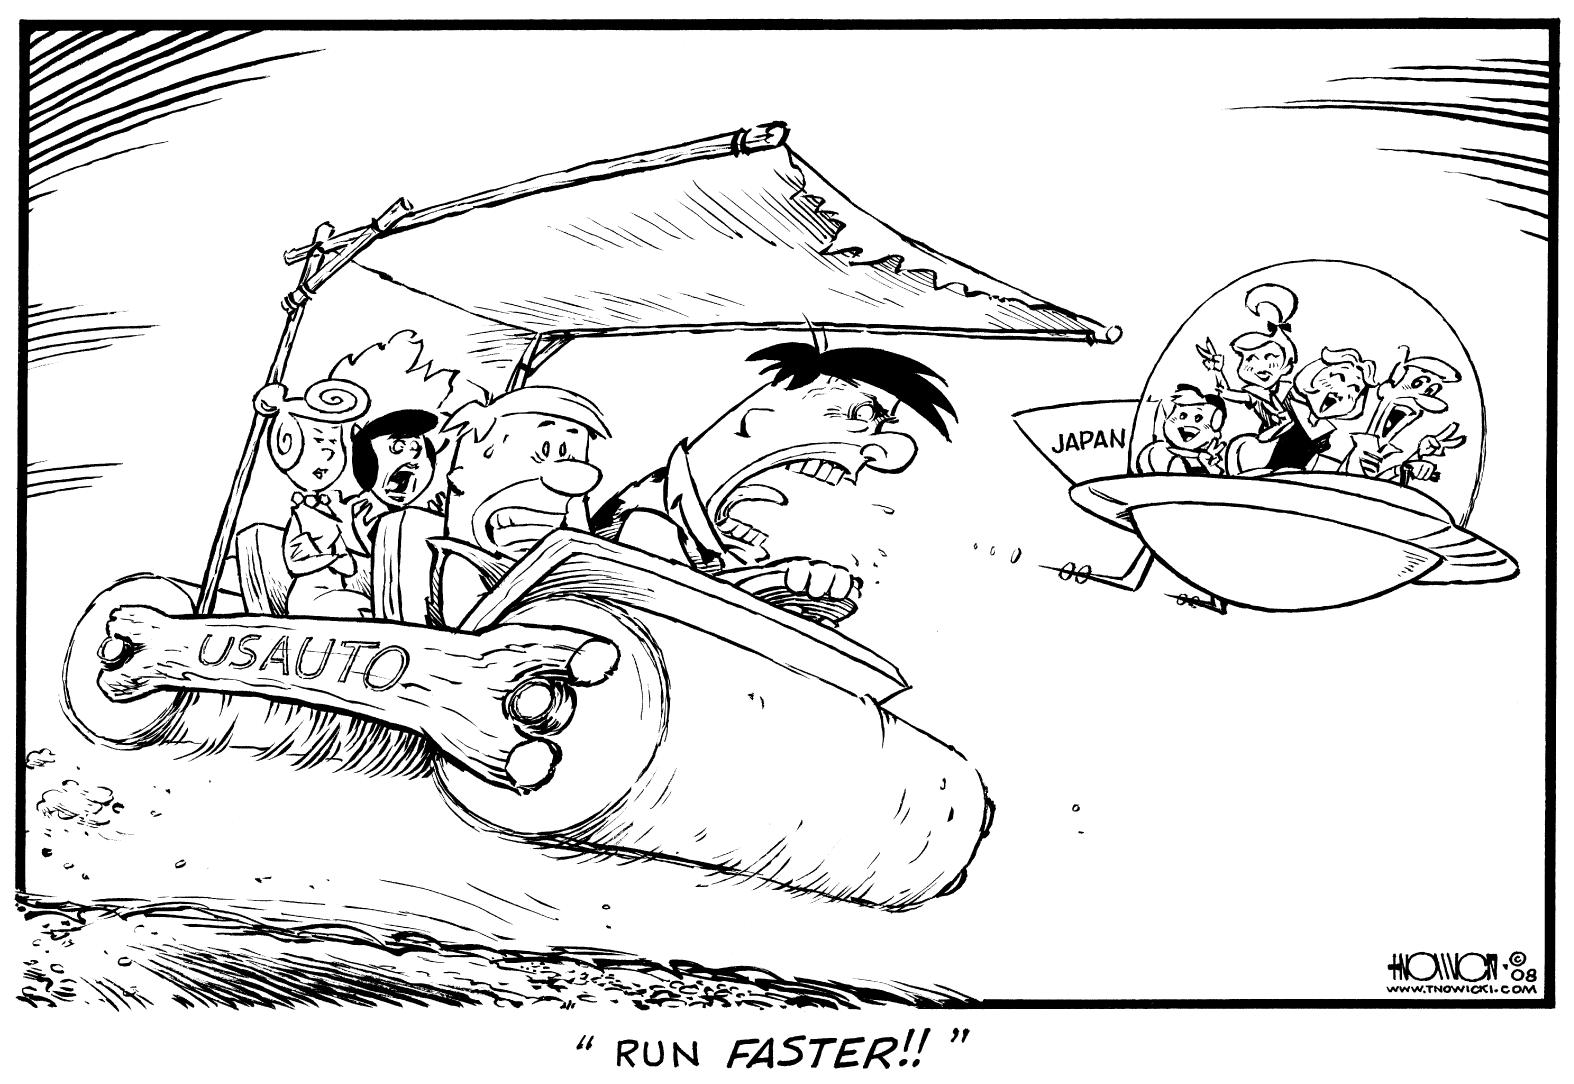 The Jetsons Beat the Flintstones